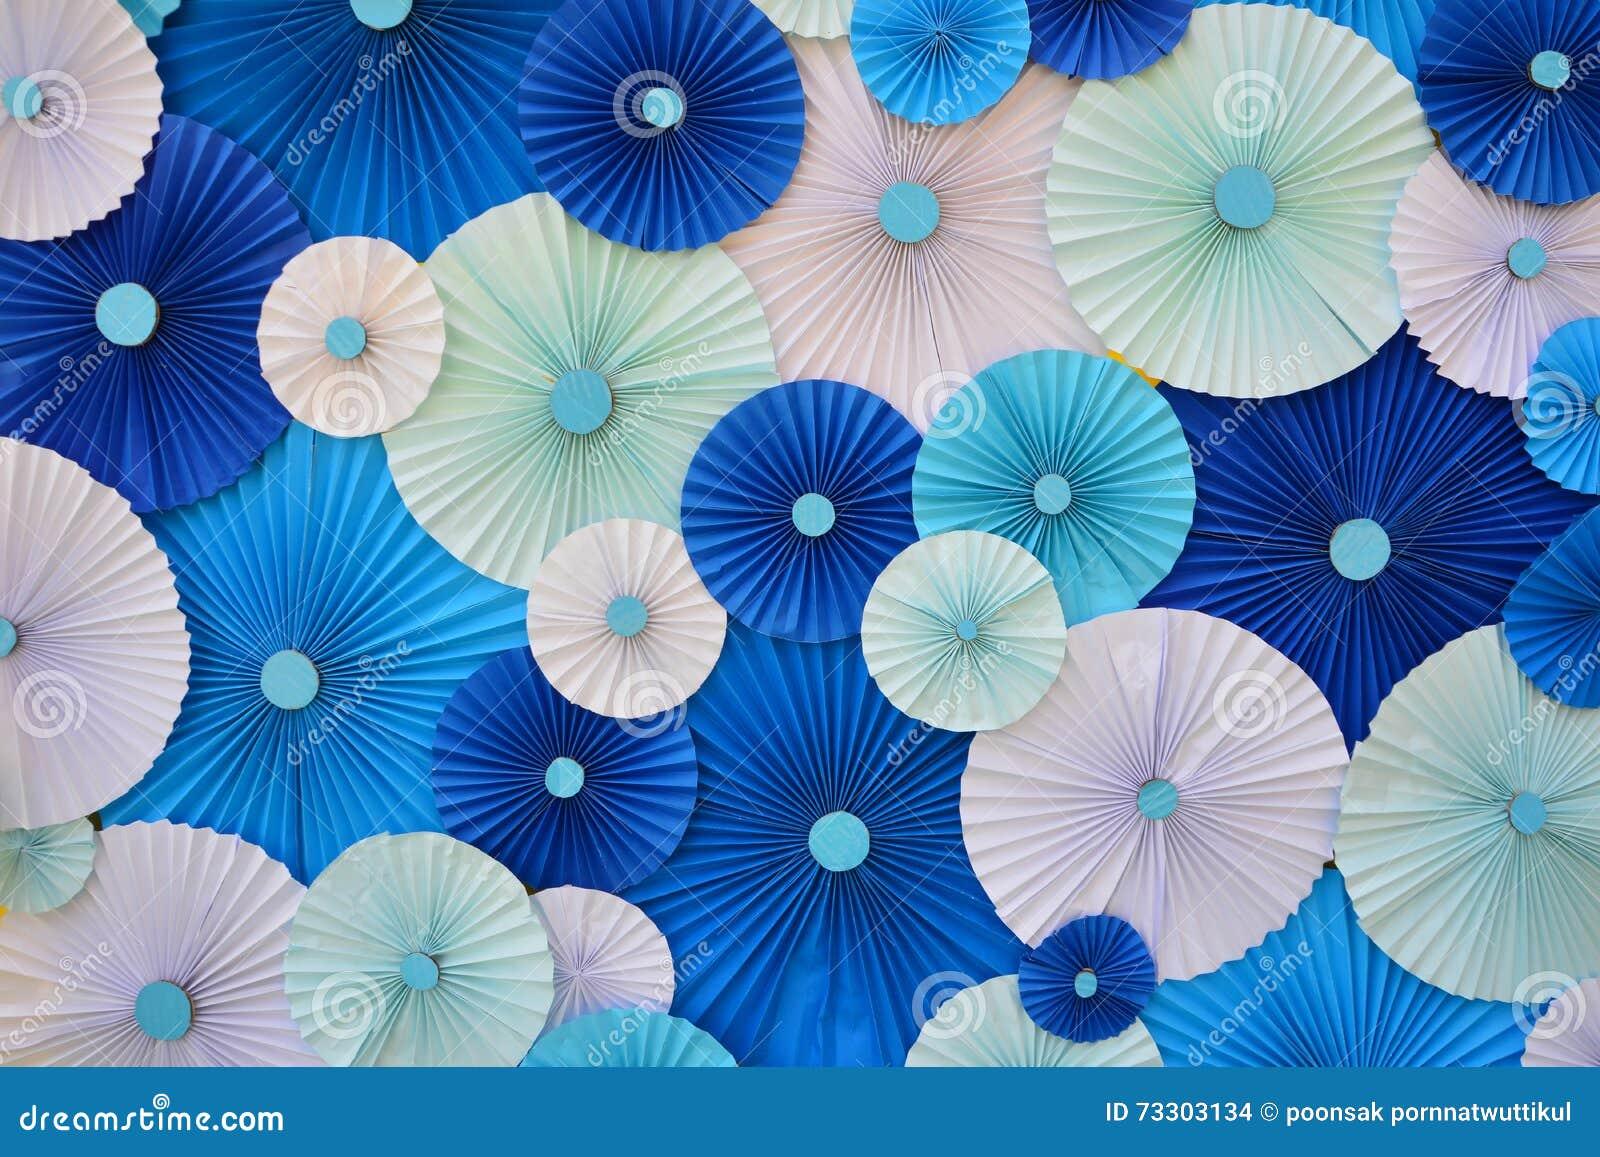 Pliage de papier multicolore